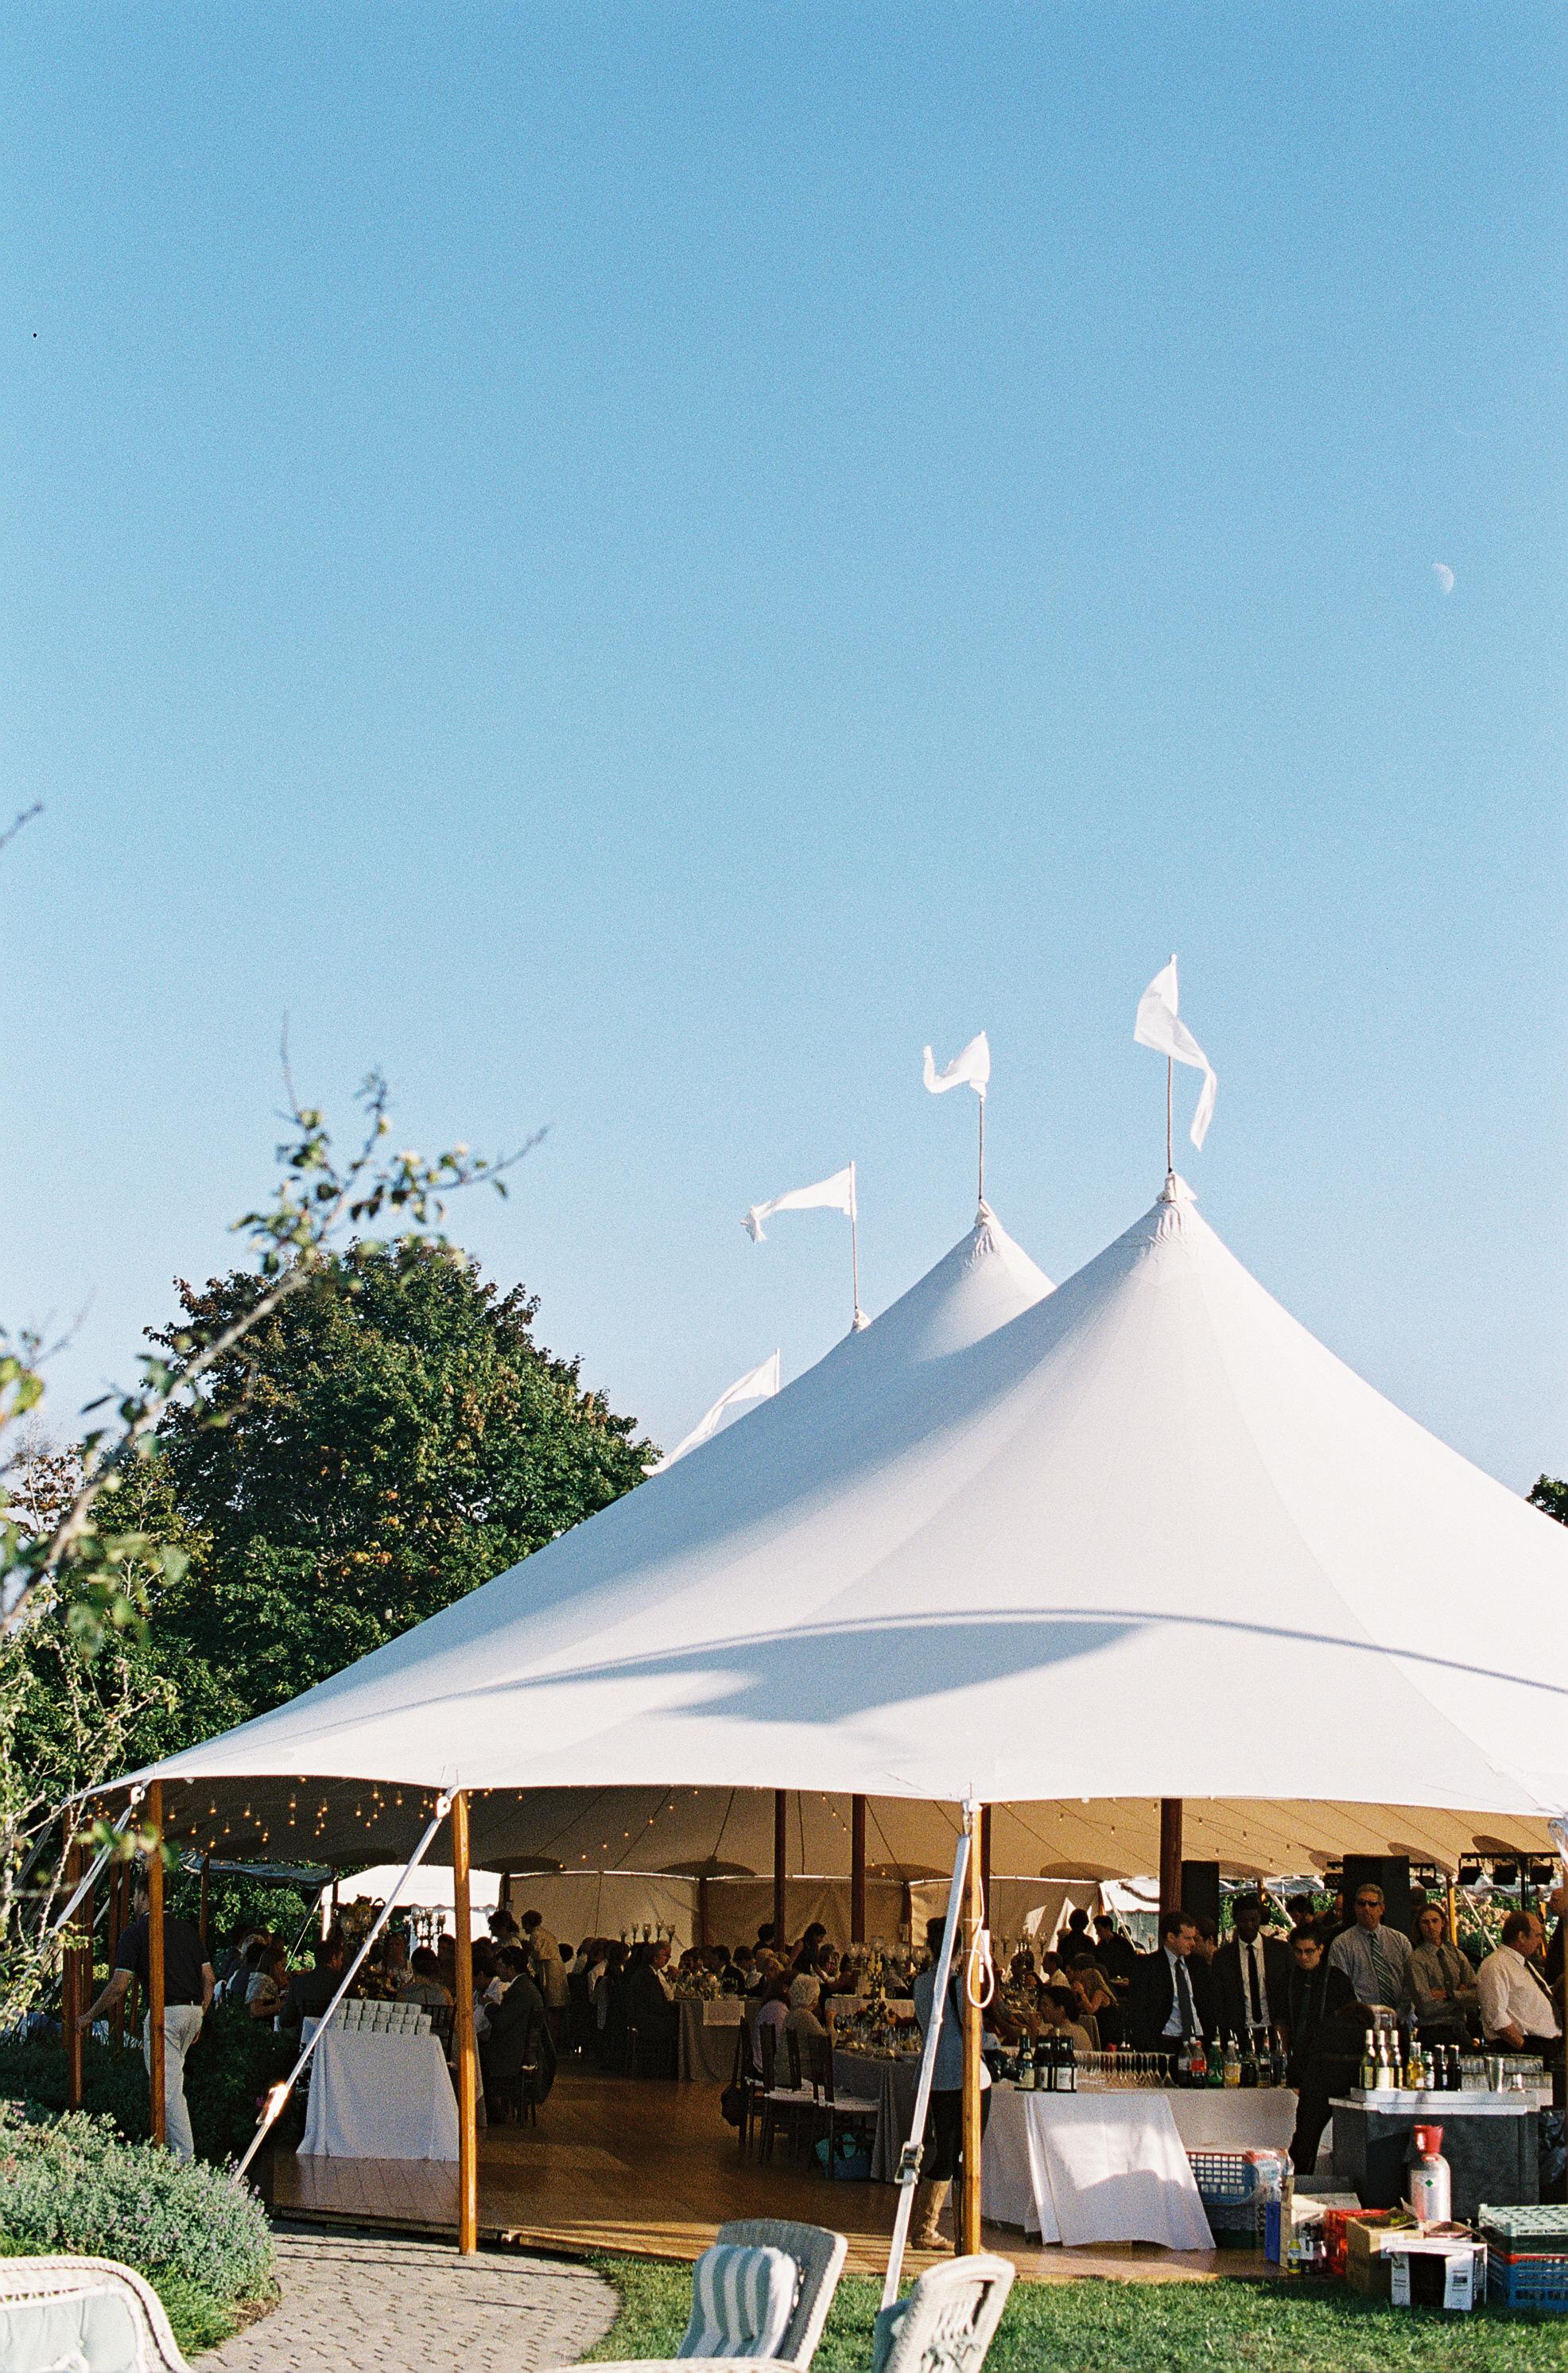 chebeague_island_inn_wedding_gabe_aceves026.JPG